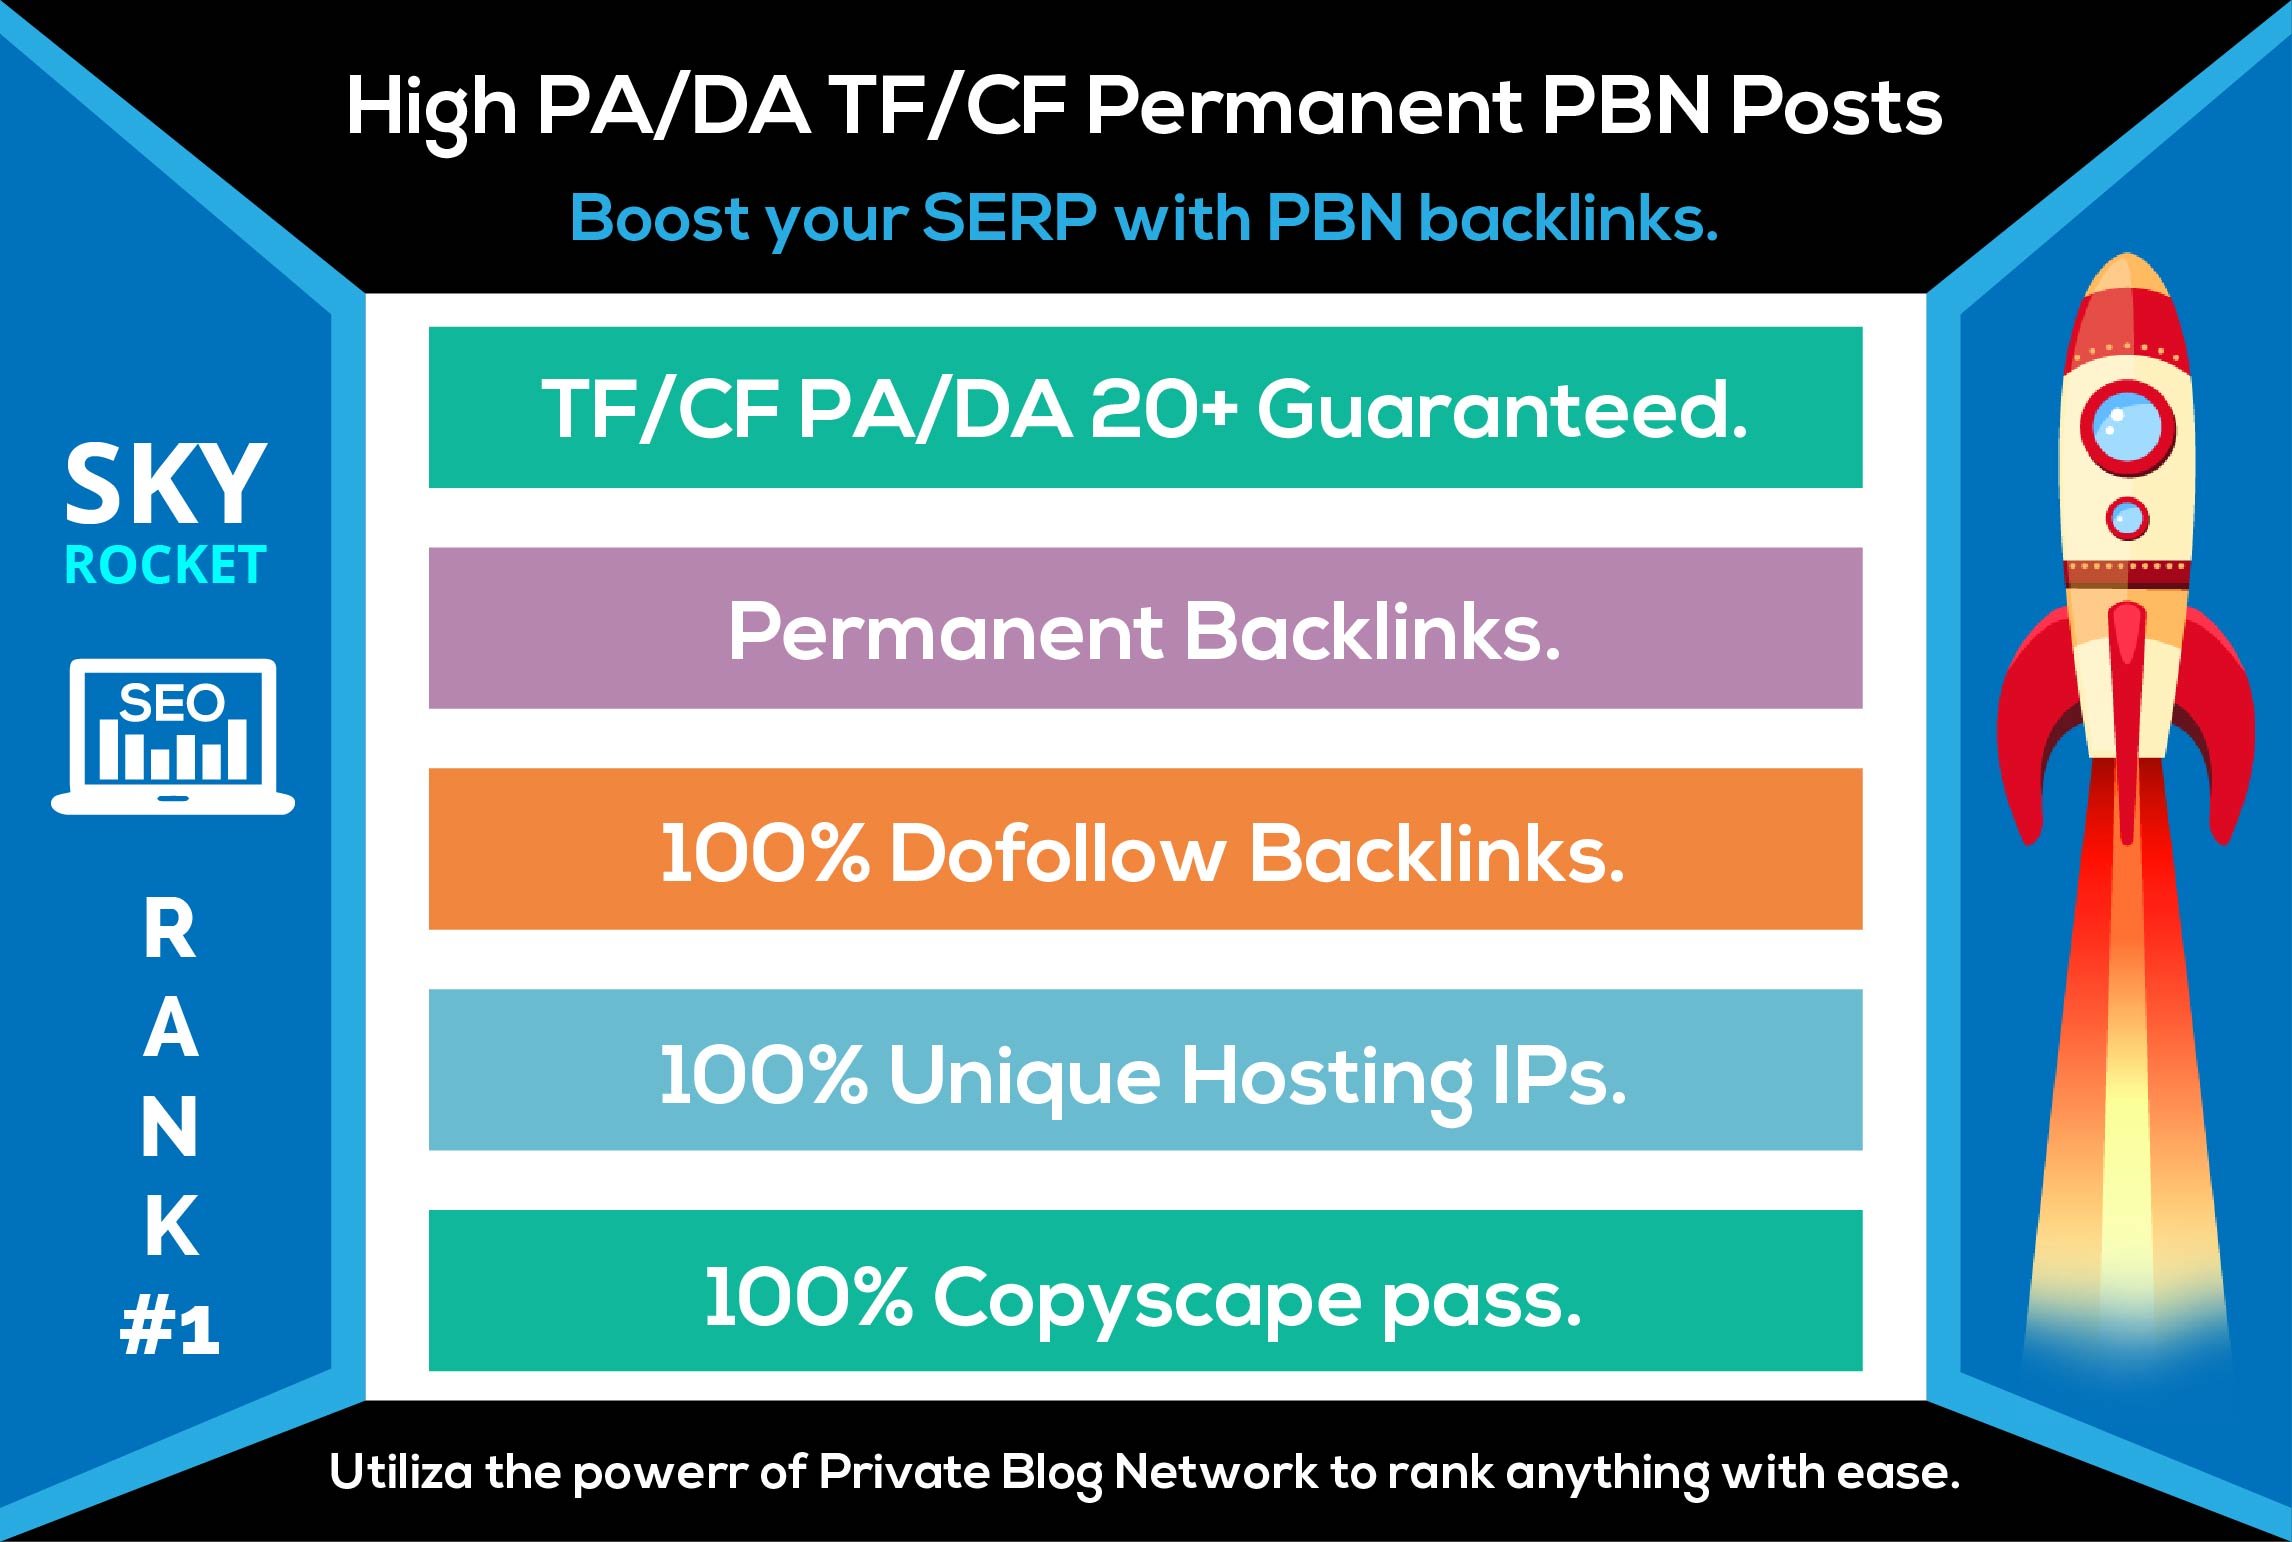 Create 25 High PA/DA TF/CF Homepage PBN Backlinks To Skyrocket you SERP